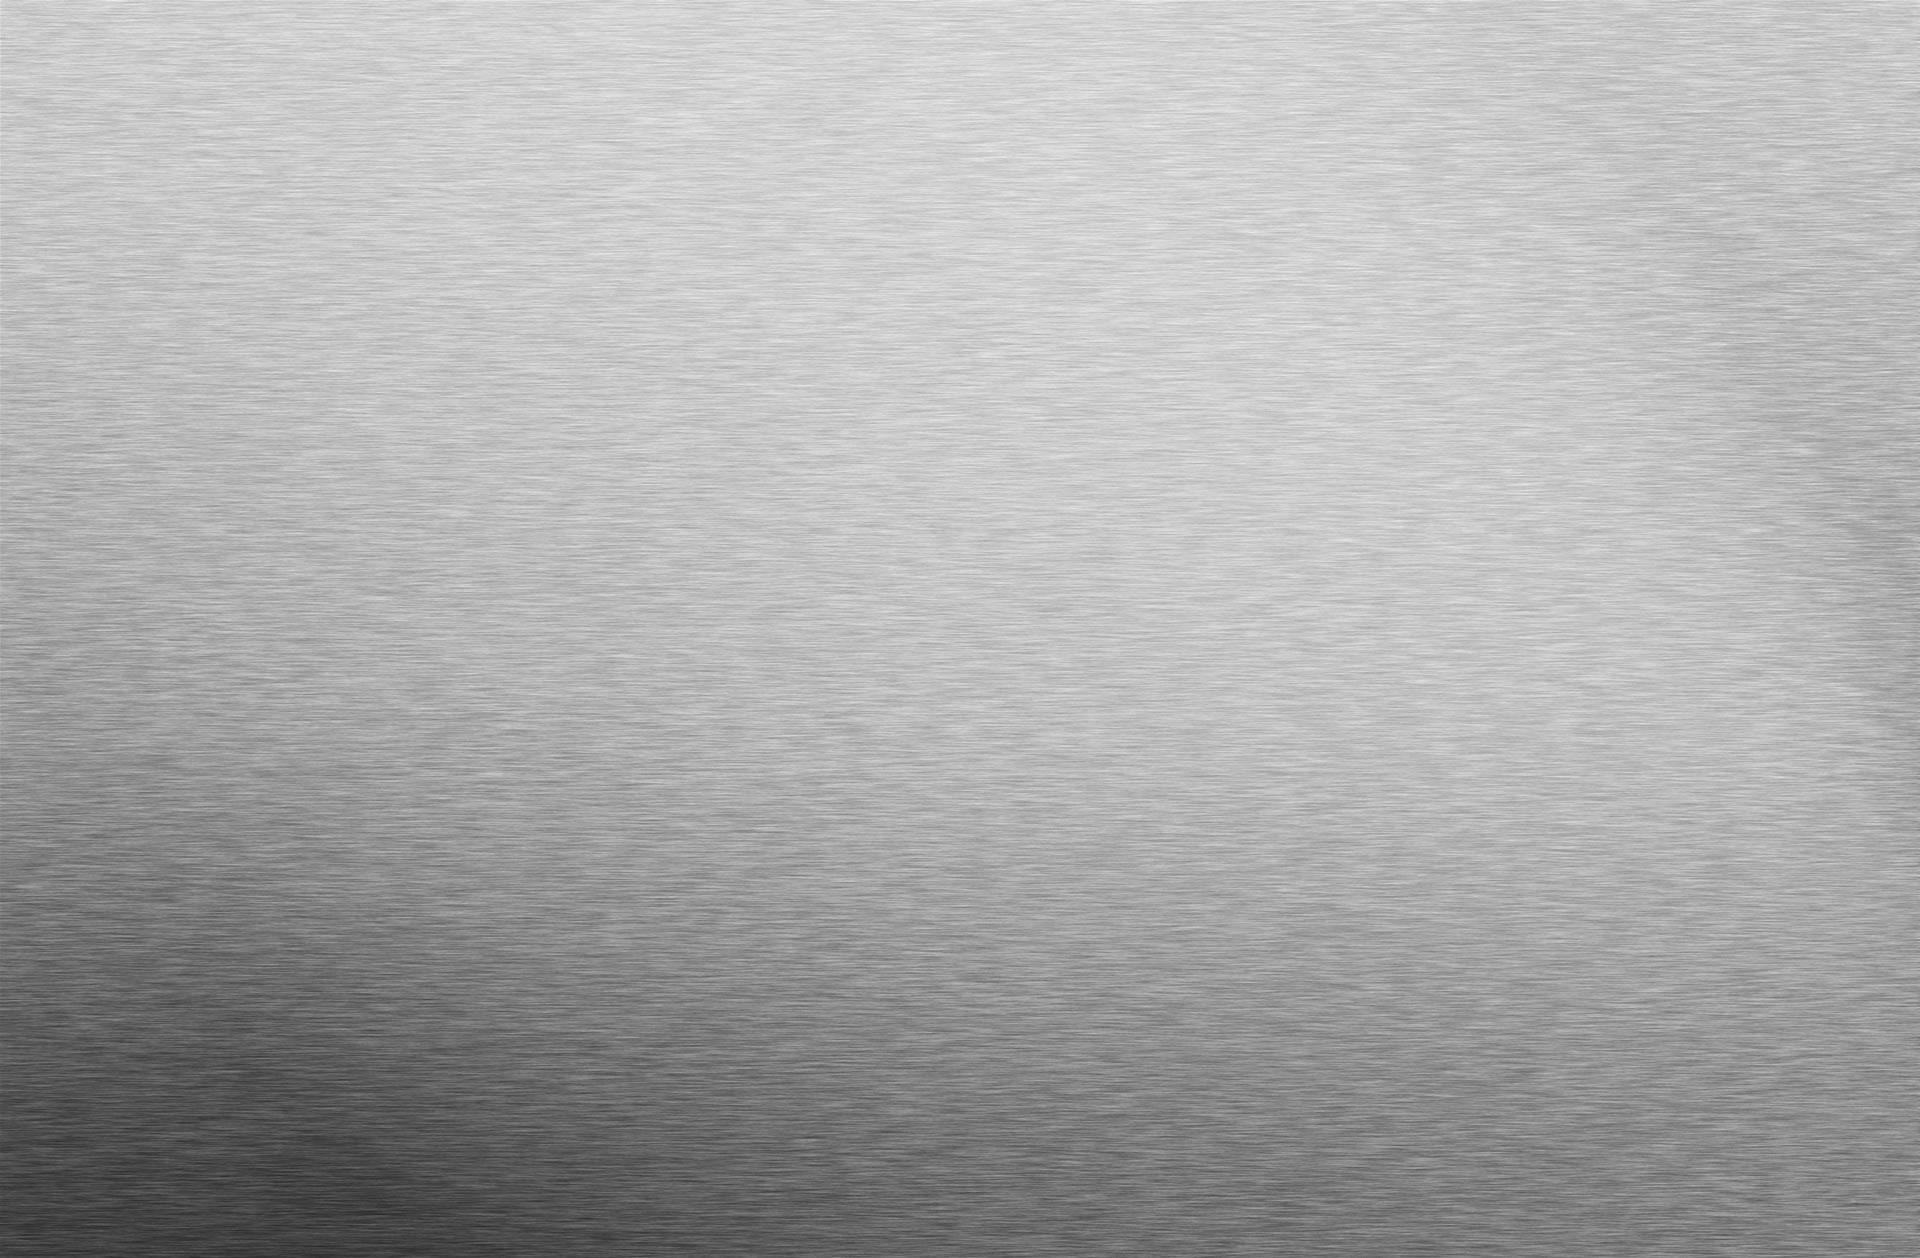 aluminum texture background download aluminum texture background 1920x1258